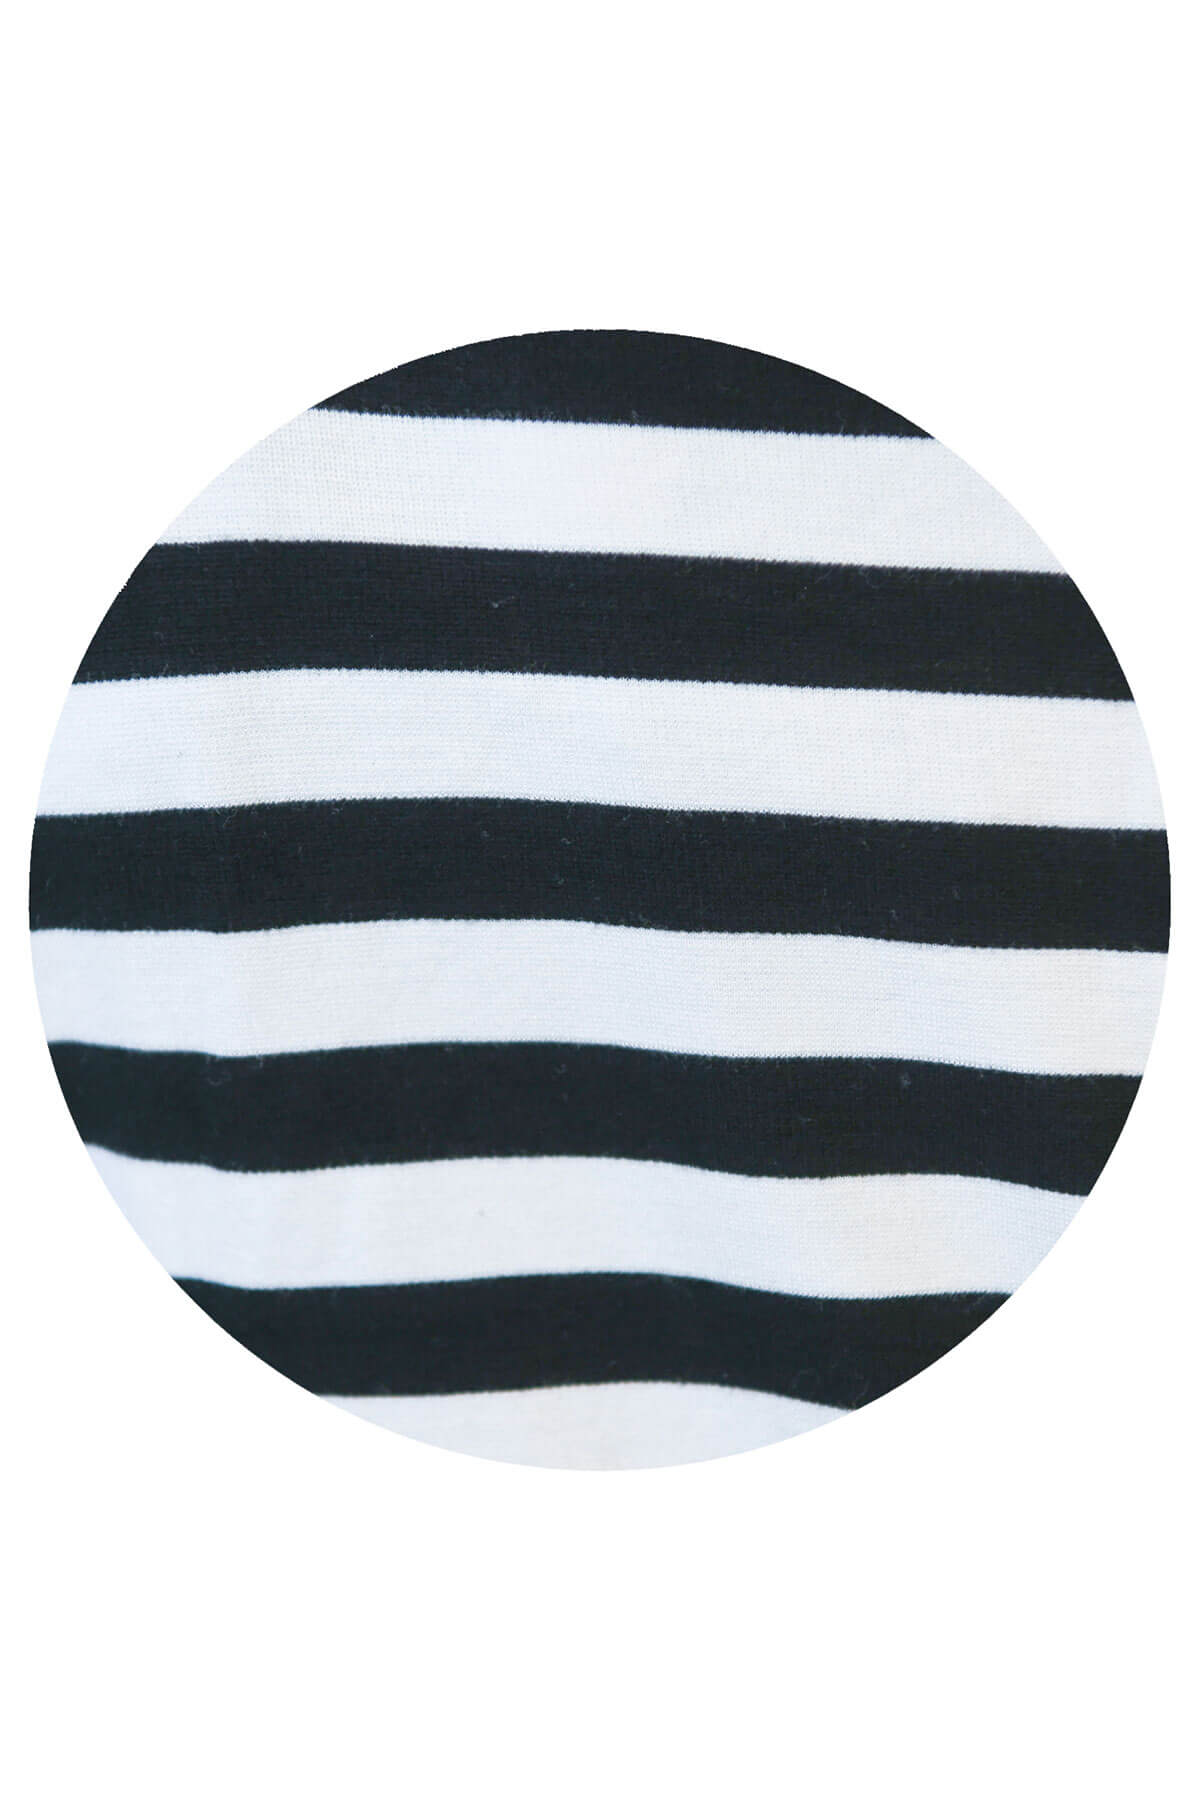 Via Appia striped top